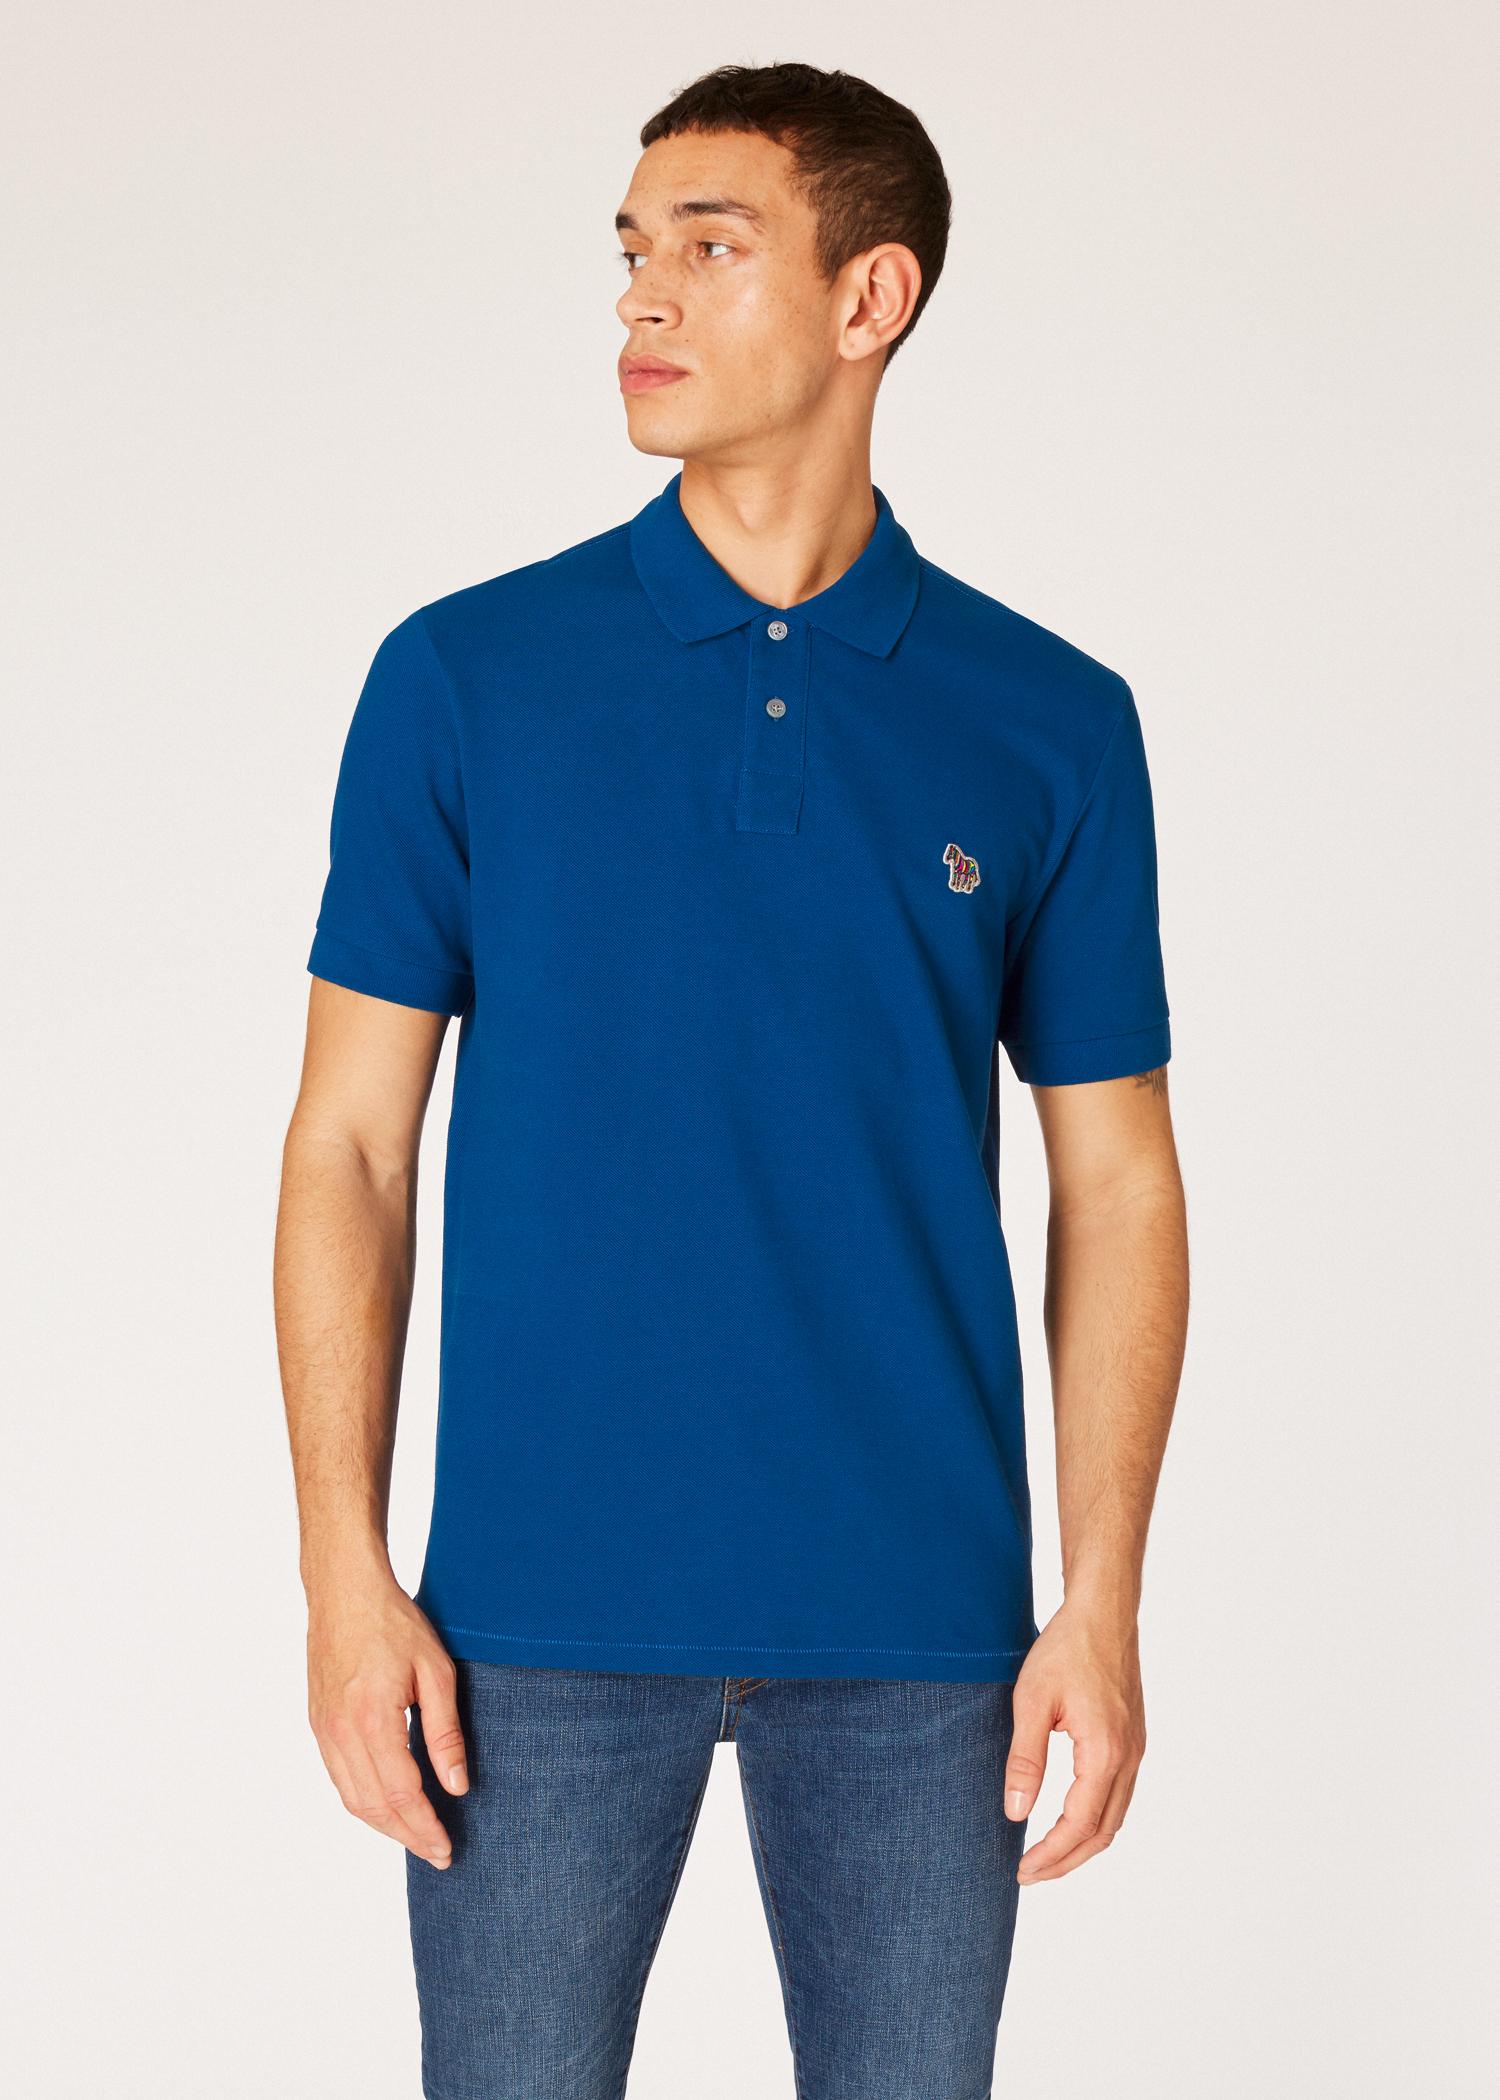 cbcd40b3d Model front close up -Men's Cobalt Blue Organic Cotton-Piqué Zebra Logo Polo  Shirt